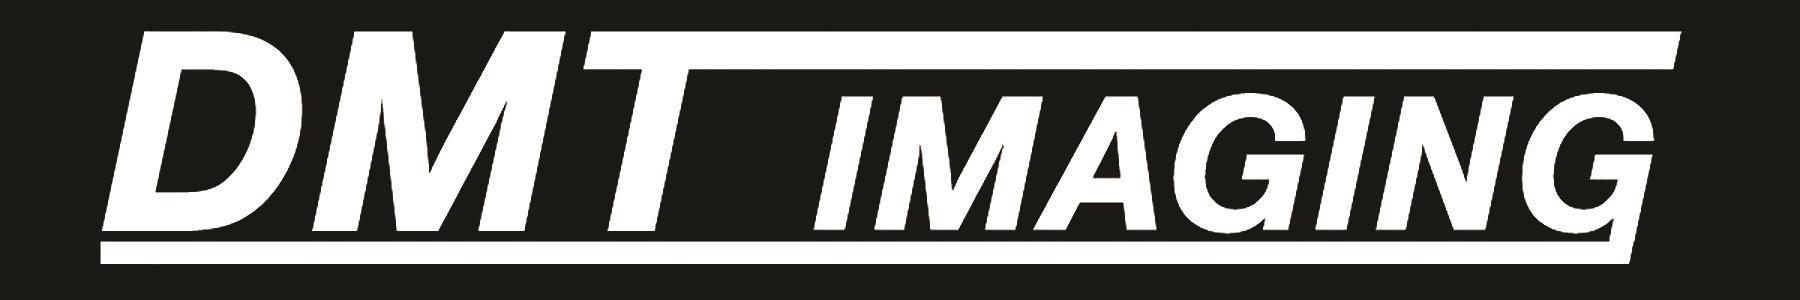 DMT Imaging logo